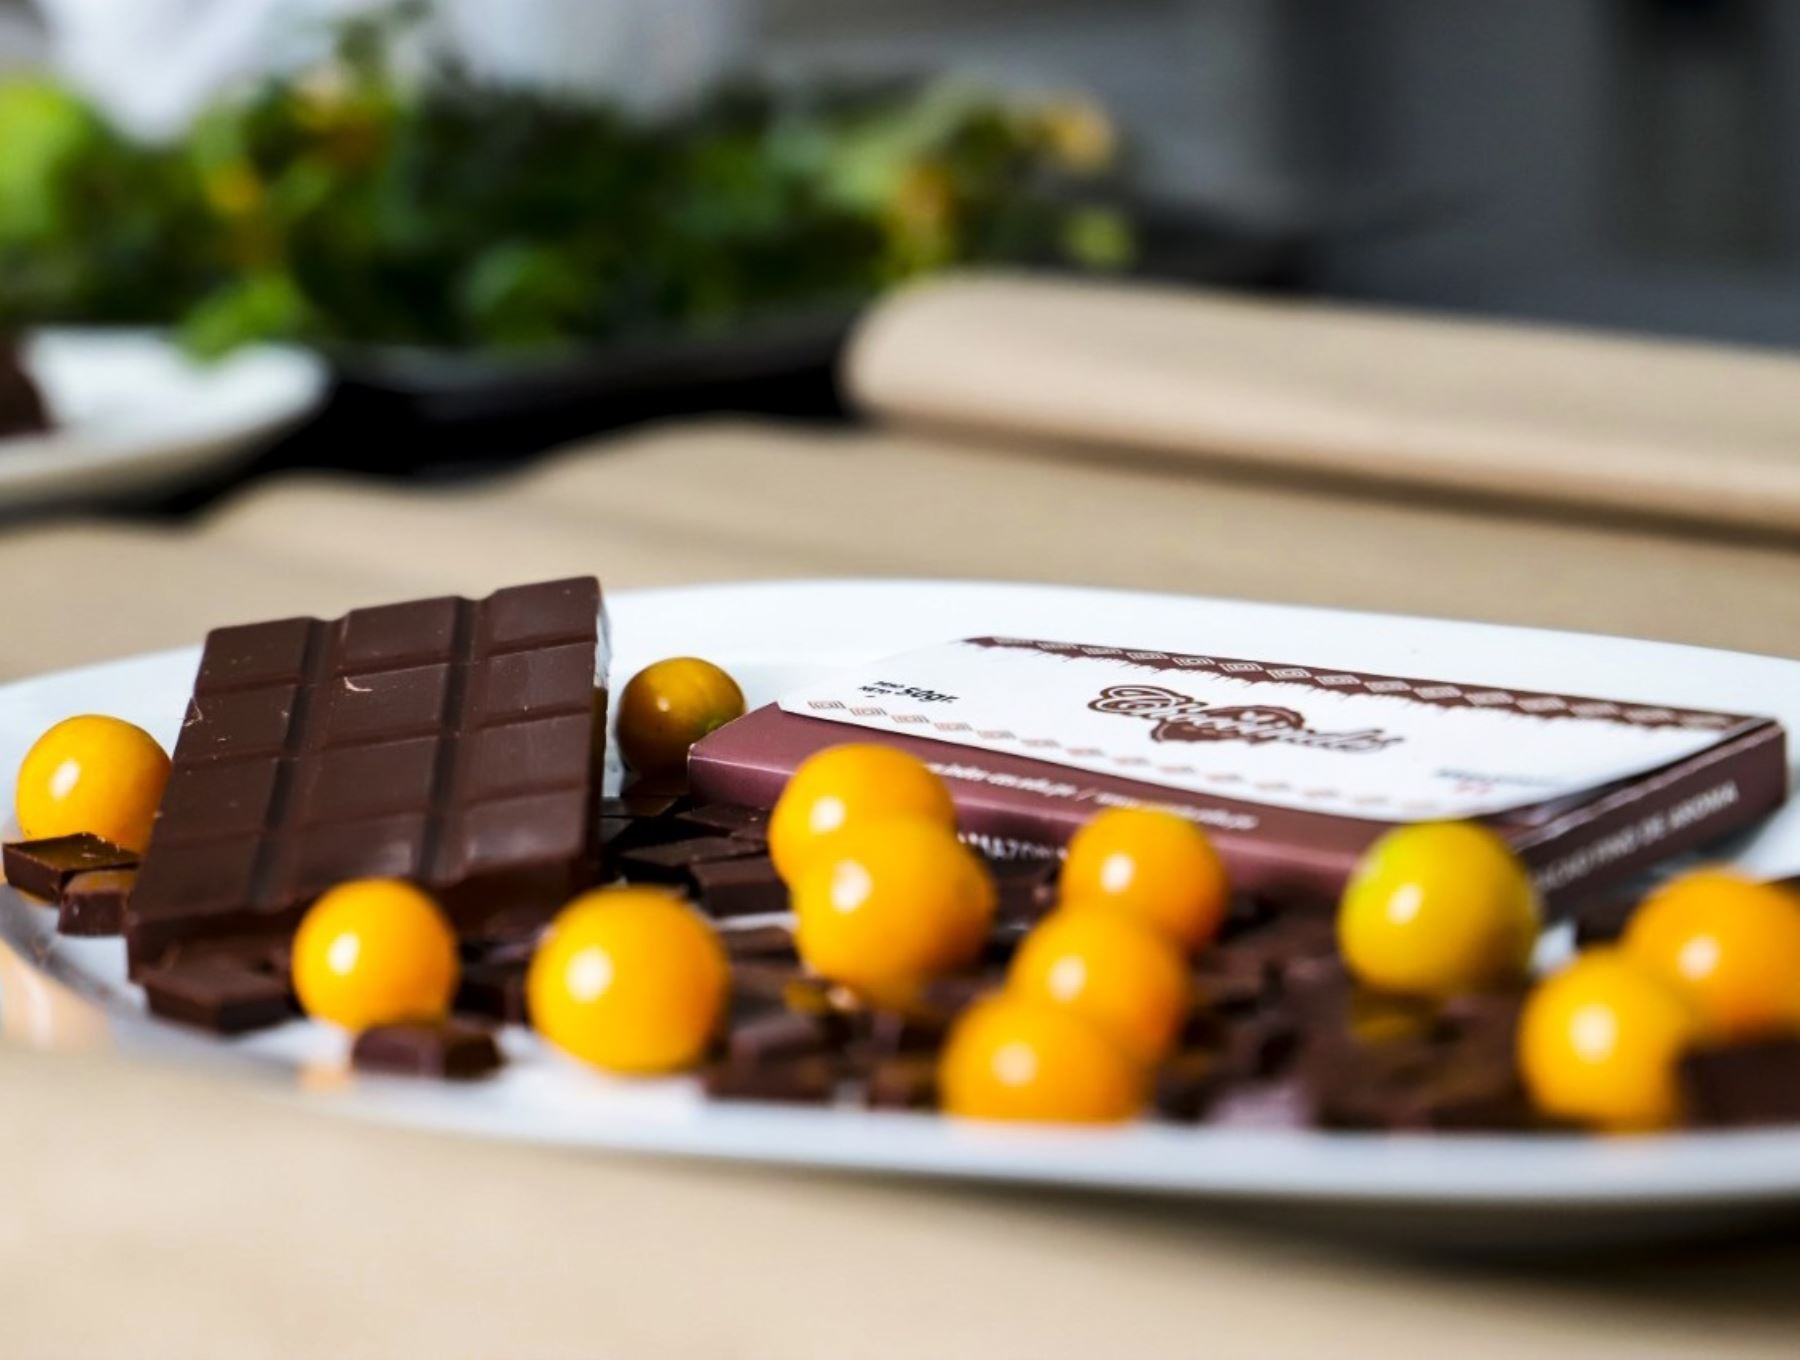 Universidad Nacional Toribio Rodríguez de Mendoza de Amazonas elabora chocolates aromatizados con frutos nativos para dar valor agregado al cacao nativo. ANDINA/Difusión